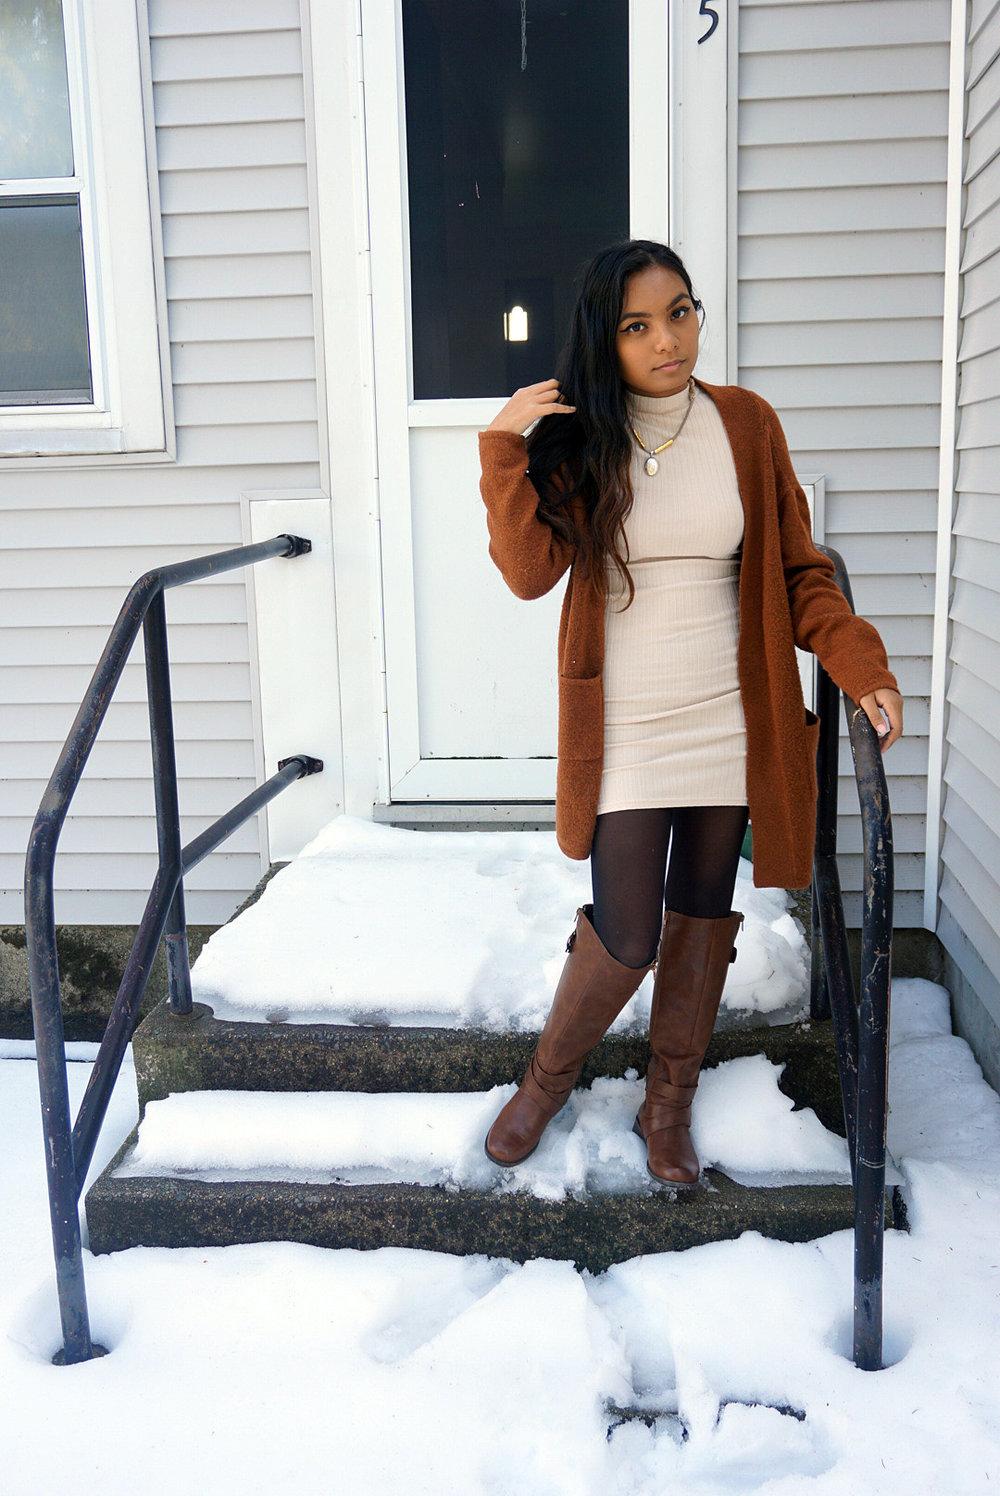 White-Dress-Caramel-Cardigan-Transitioning-To-Spring-Fashionista-Blogger-Style-LINDATENCHITRAN-1-1080x1616.jpg